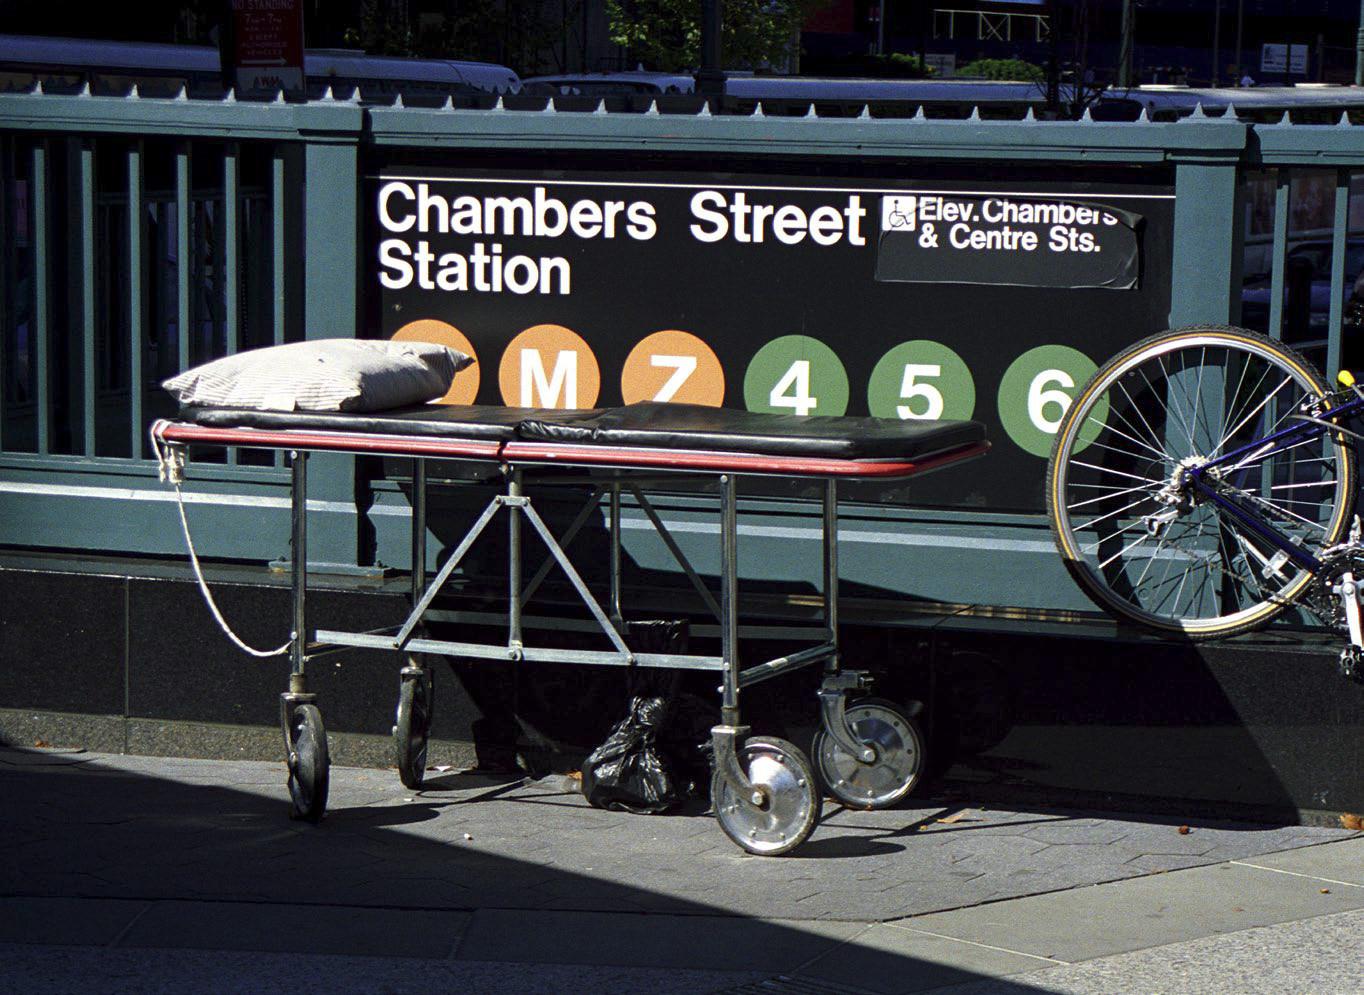 The last functioning Subway Stop before Ground Zero